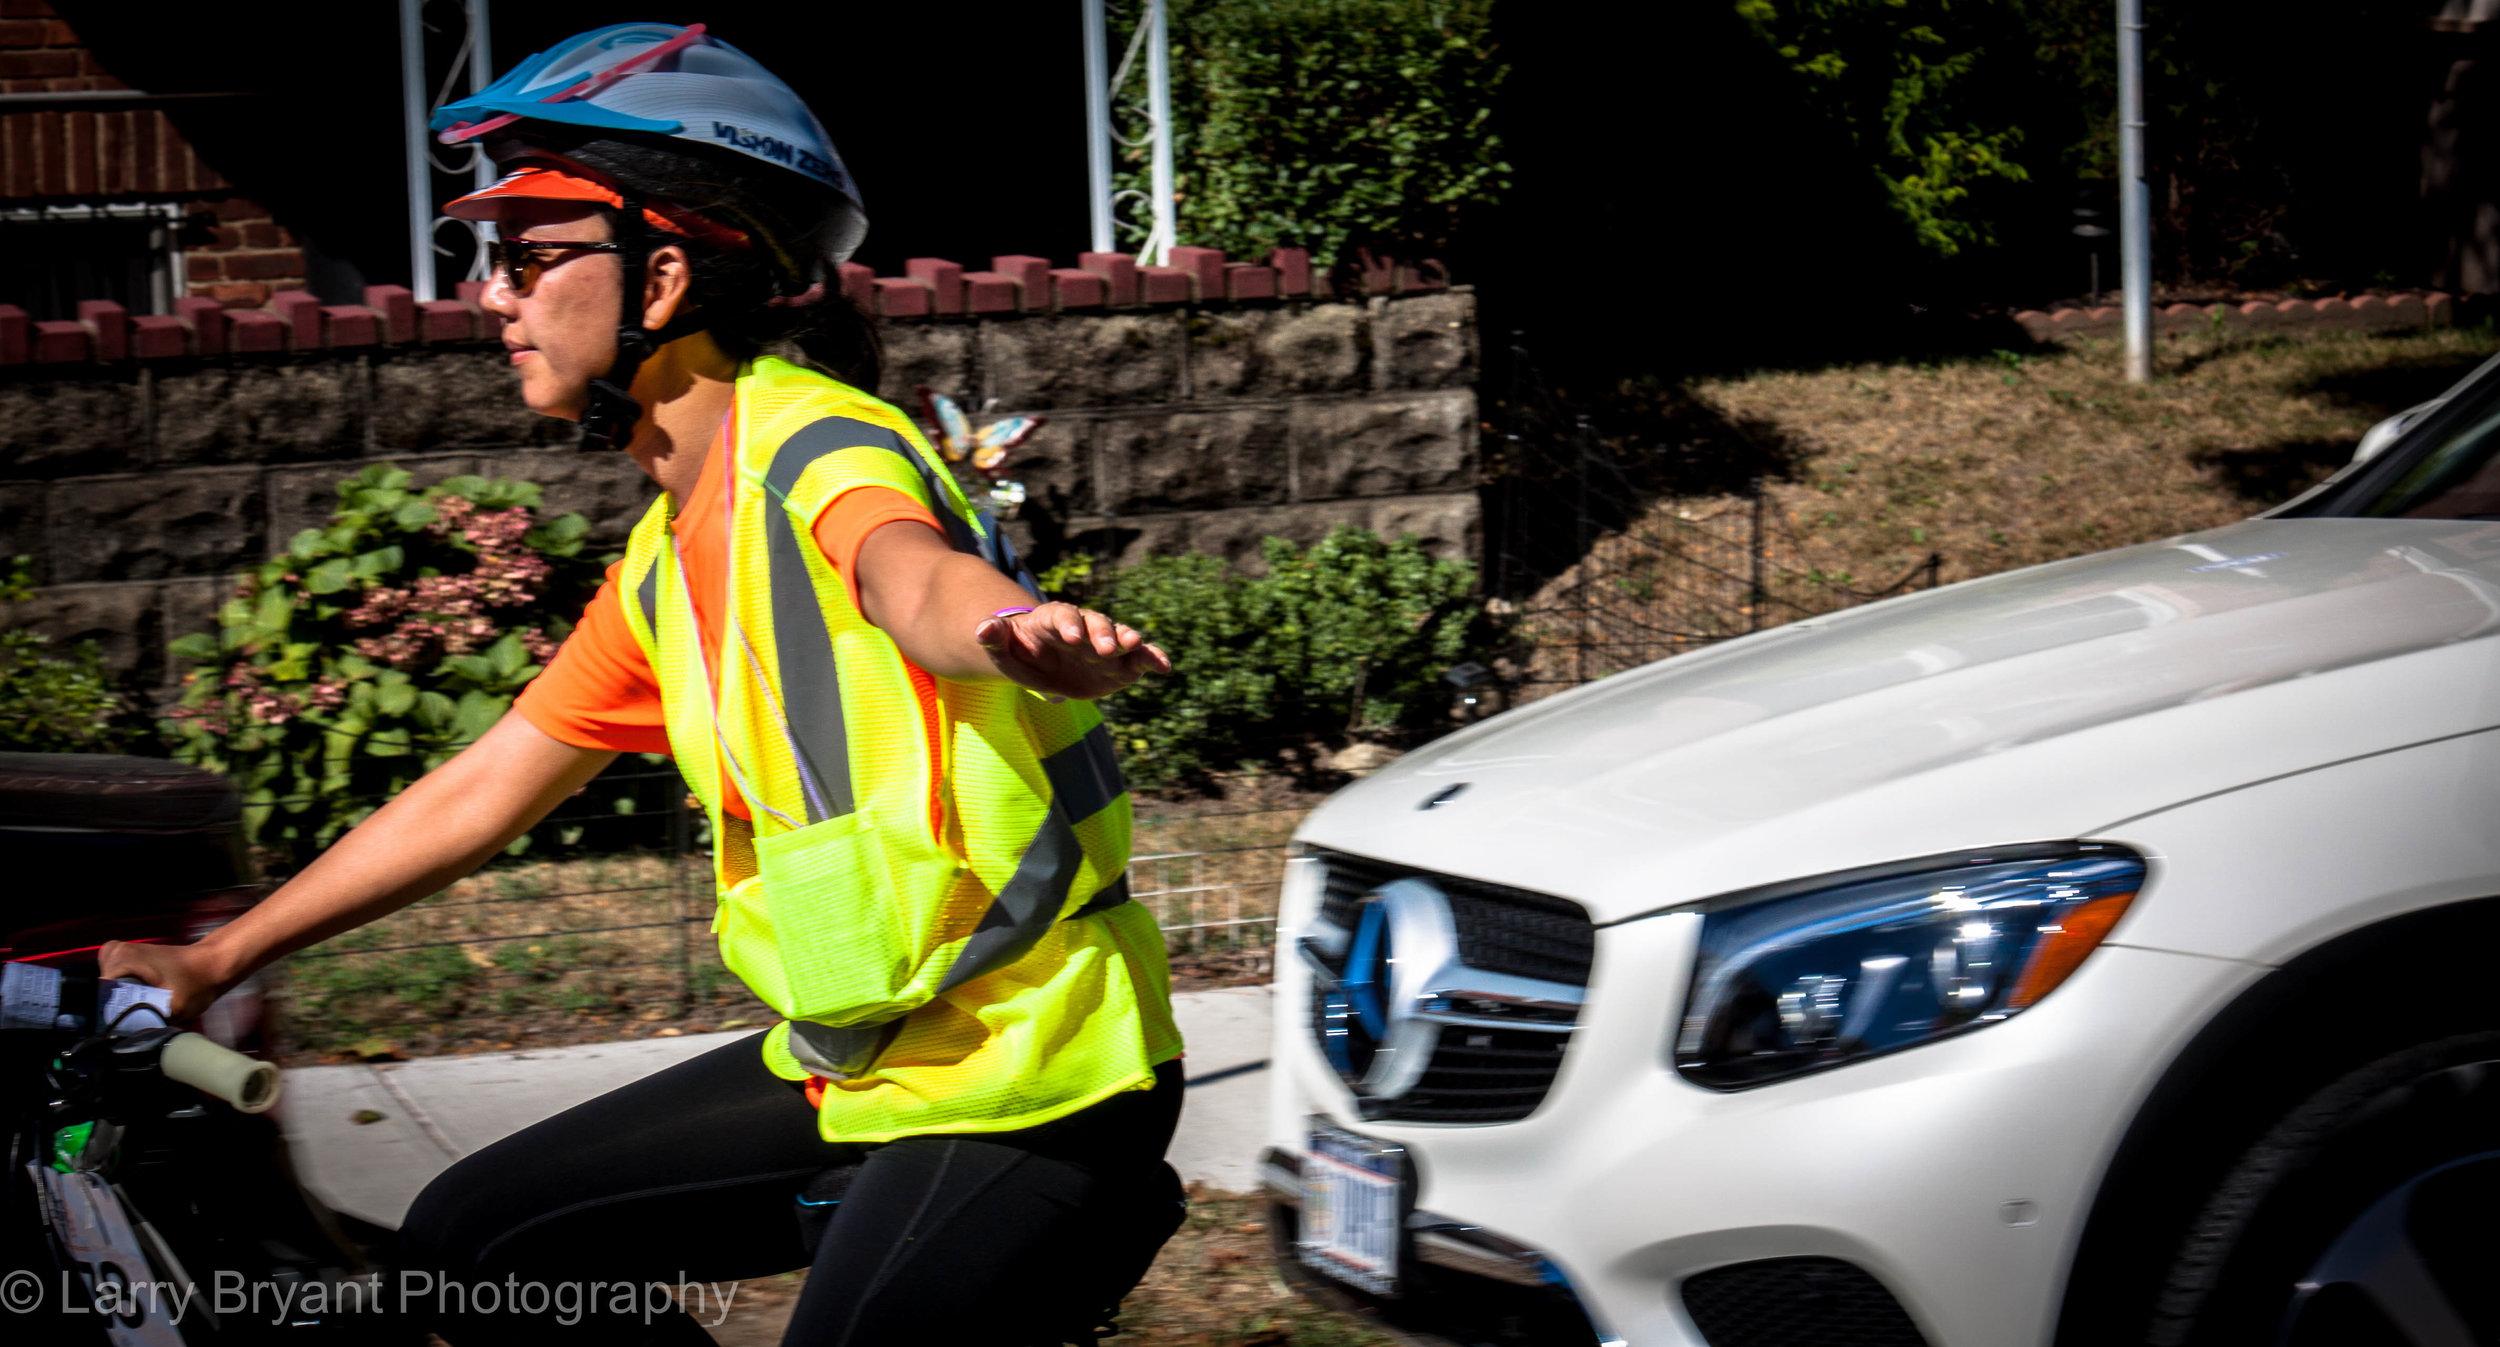 lifcyclebiking.2017.September 23, 2017-47.jpg